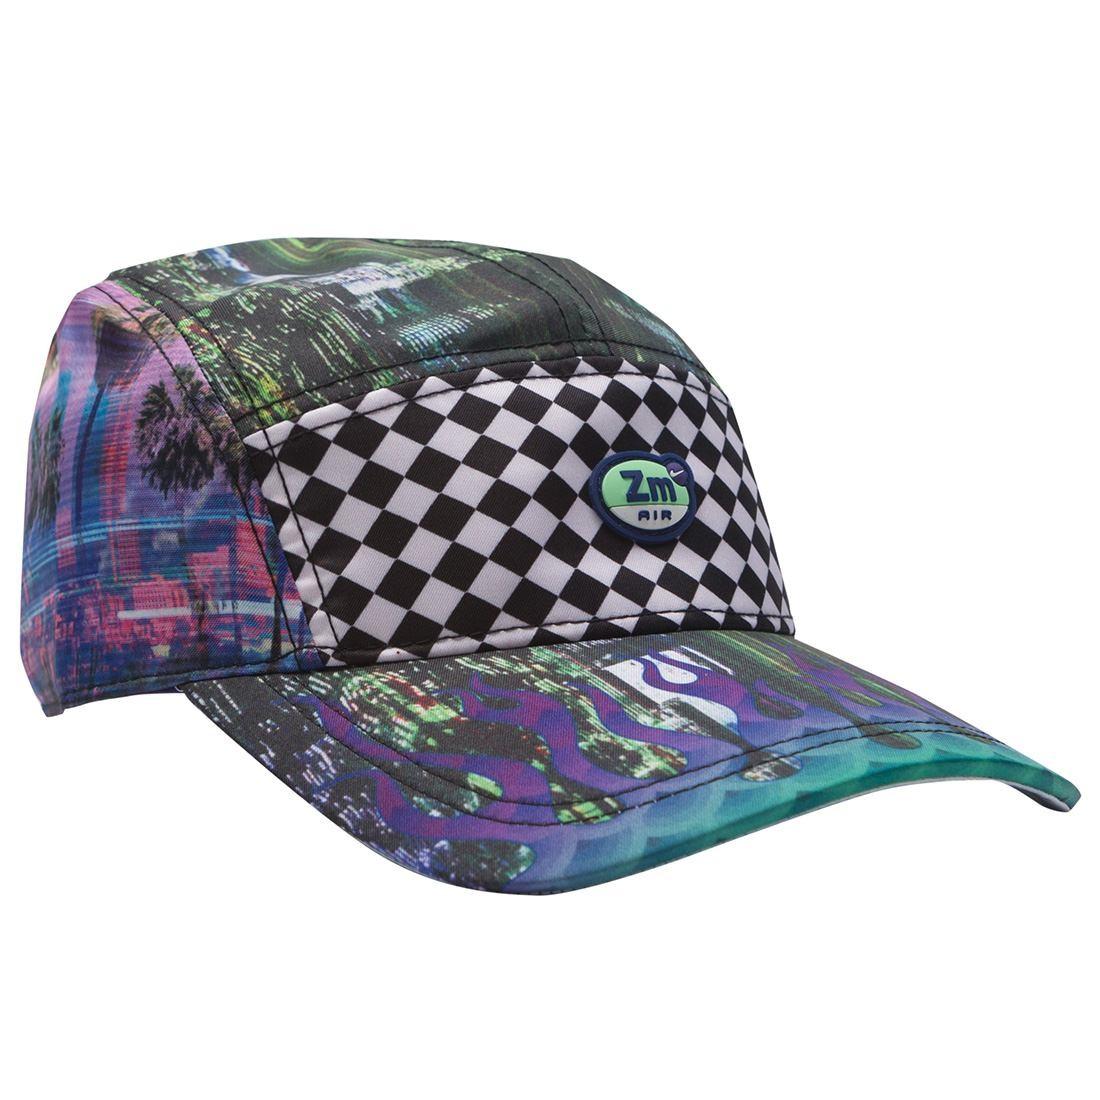 Nike Men Nrg Aw84 Cap Zm Spectrum Qs (court purple) 1S